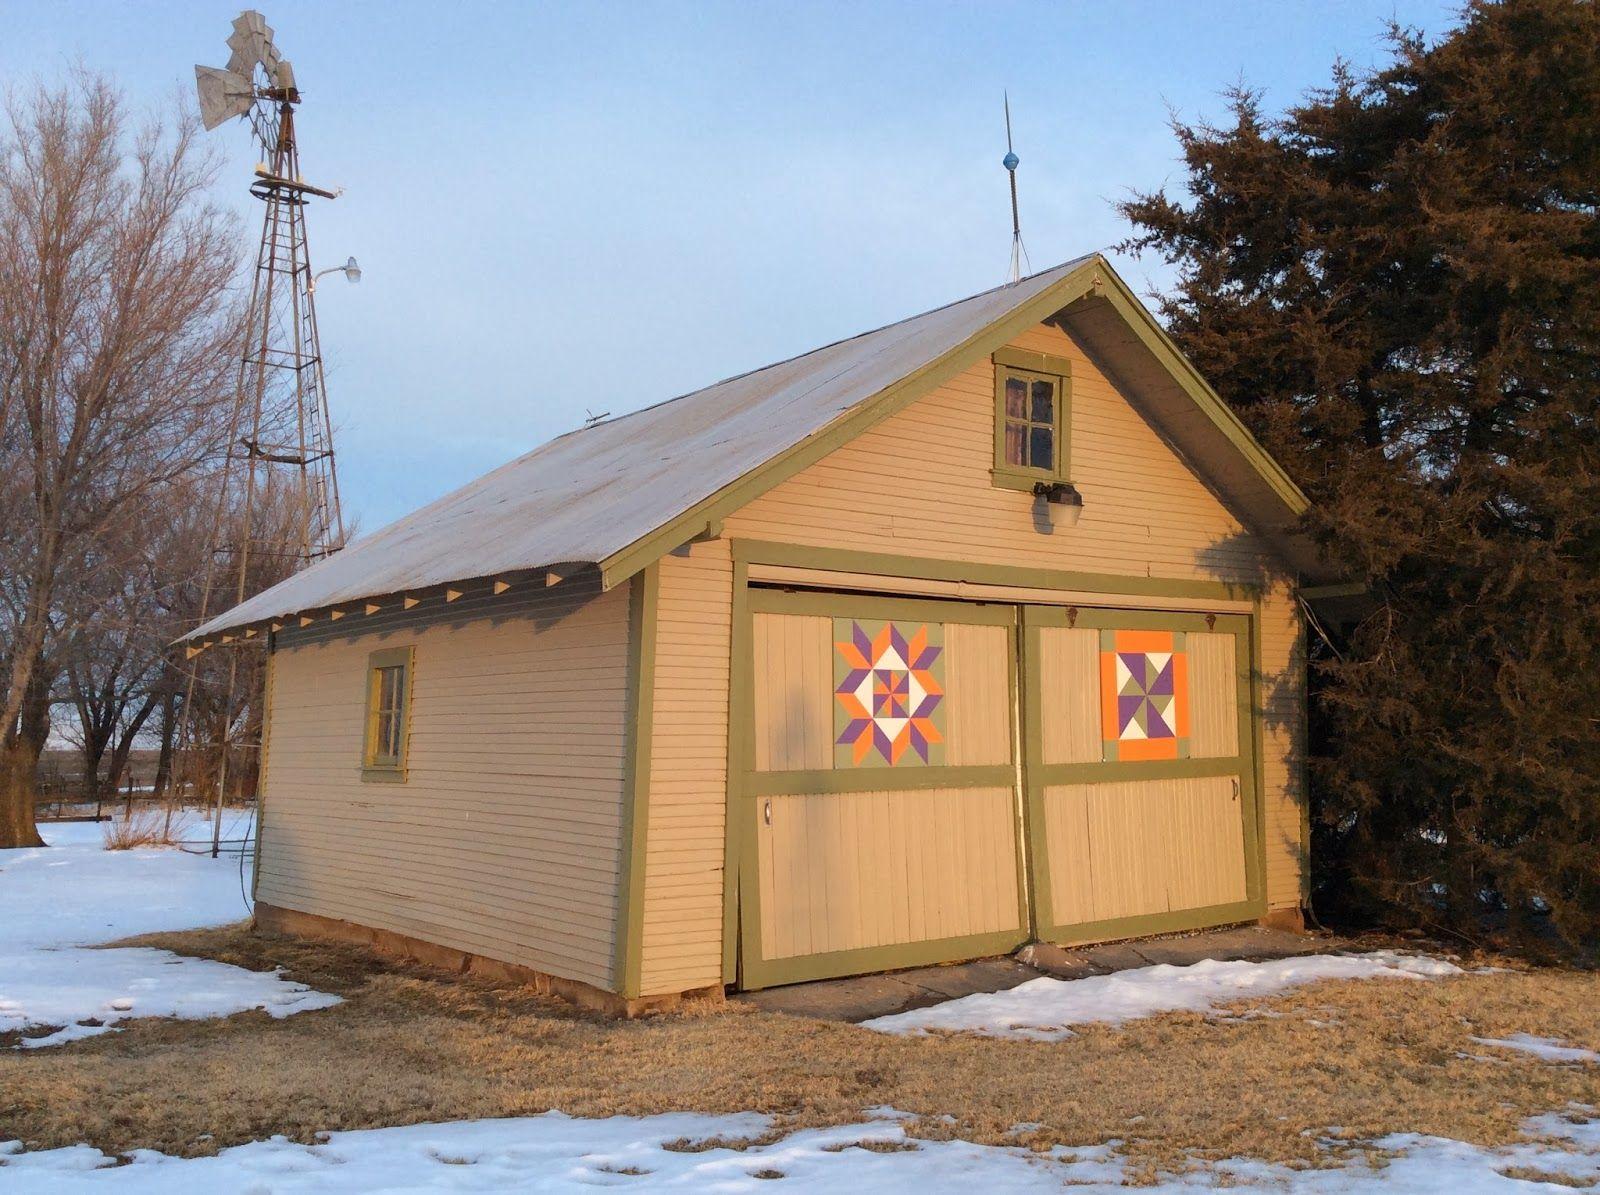 Kansas pottawatomie county fostoria - Kansas Flint Hills Quilt Trail Dickinson County Double Pinwheel And Framed